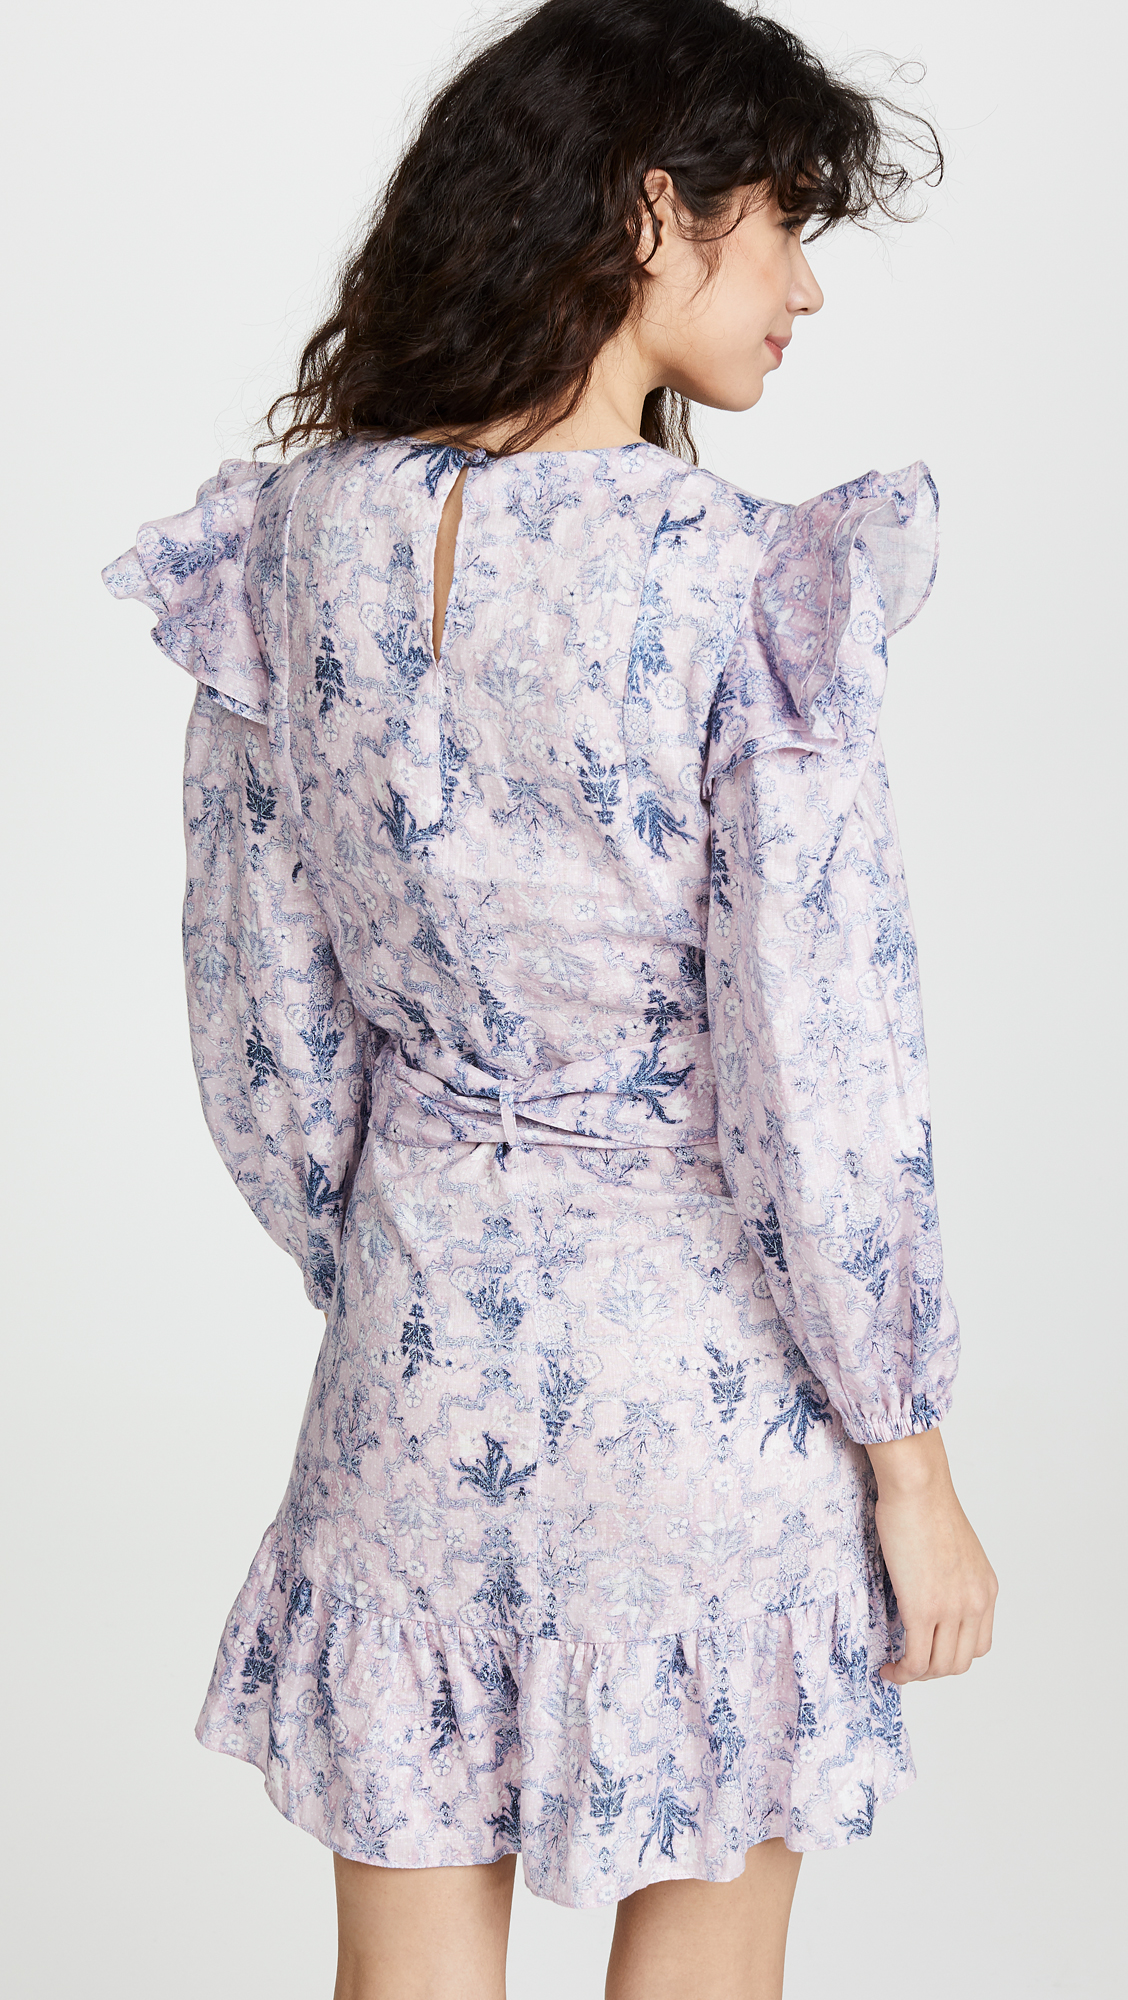 bbe9cffa6c2 Isabel Marant Etoile Telicia Dress